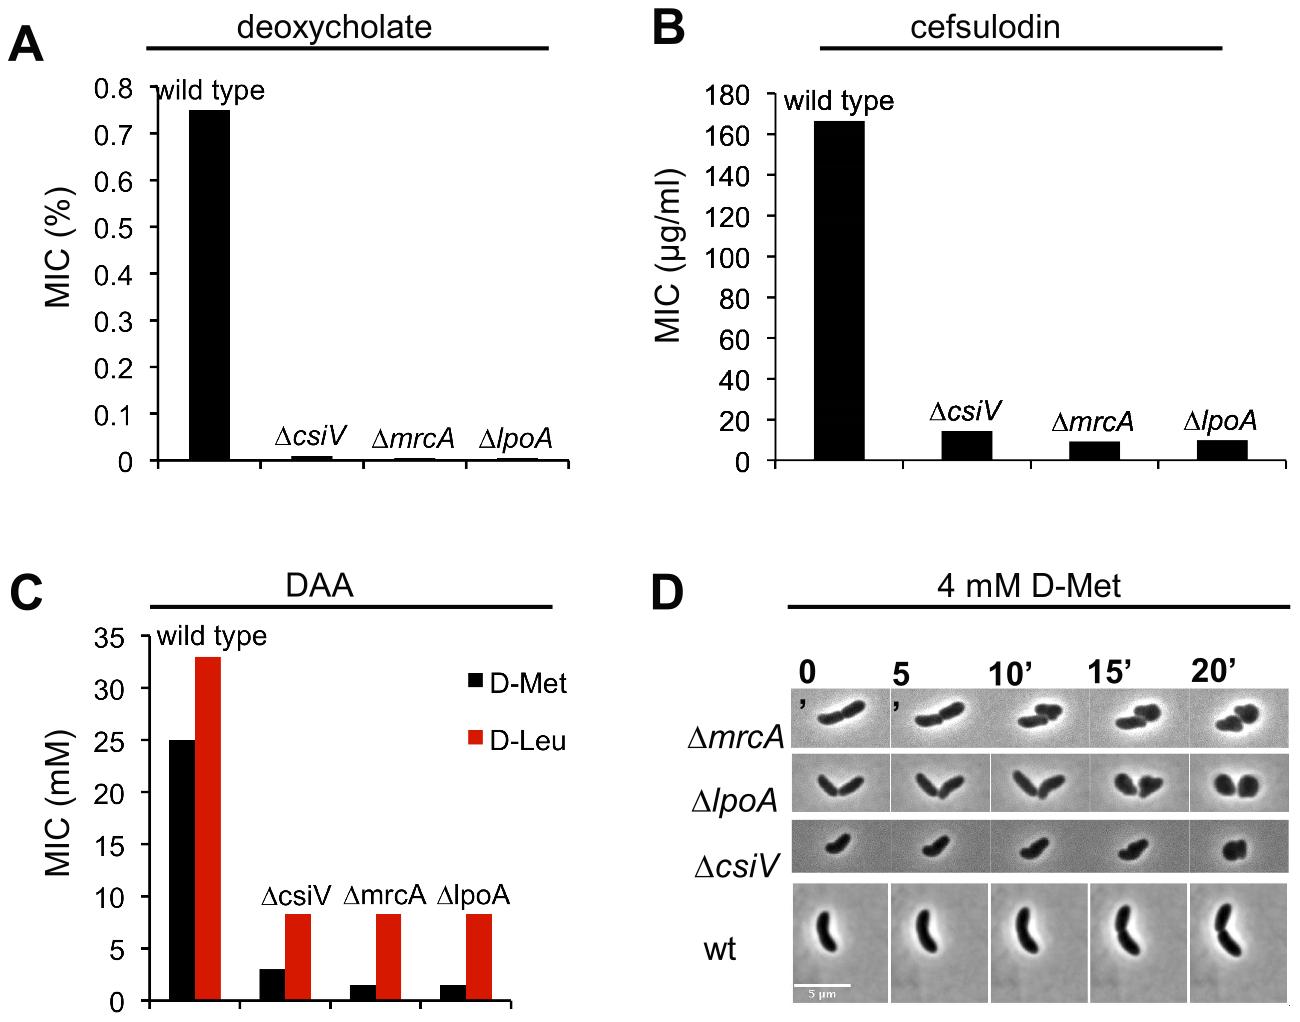 A <i>csiV</i> mutant phenocopies the growth deficiencies of <i>mrcA</i> and <i>lpoA</i> mutants.